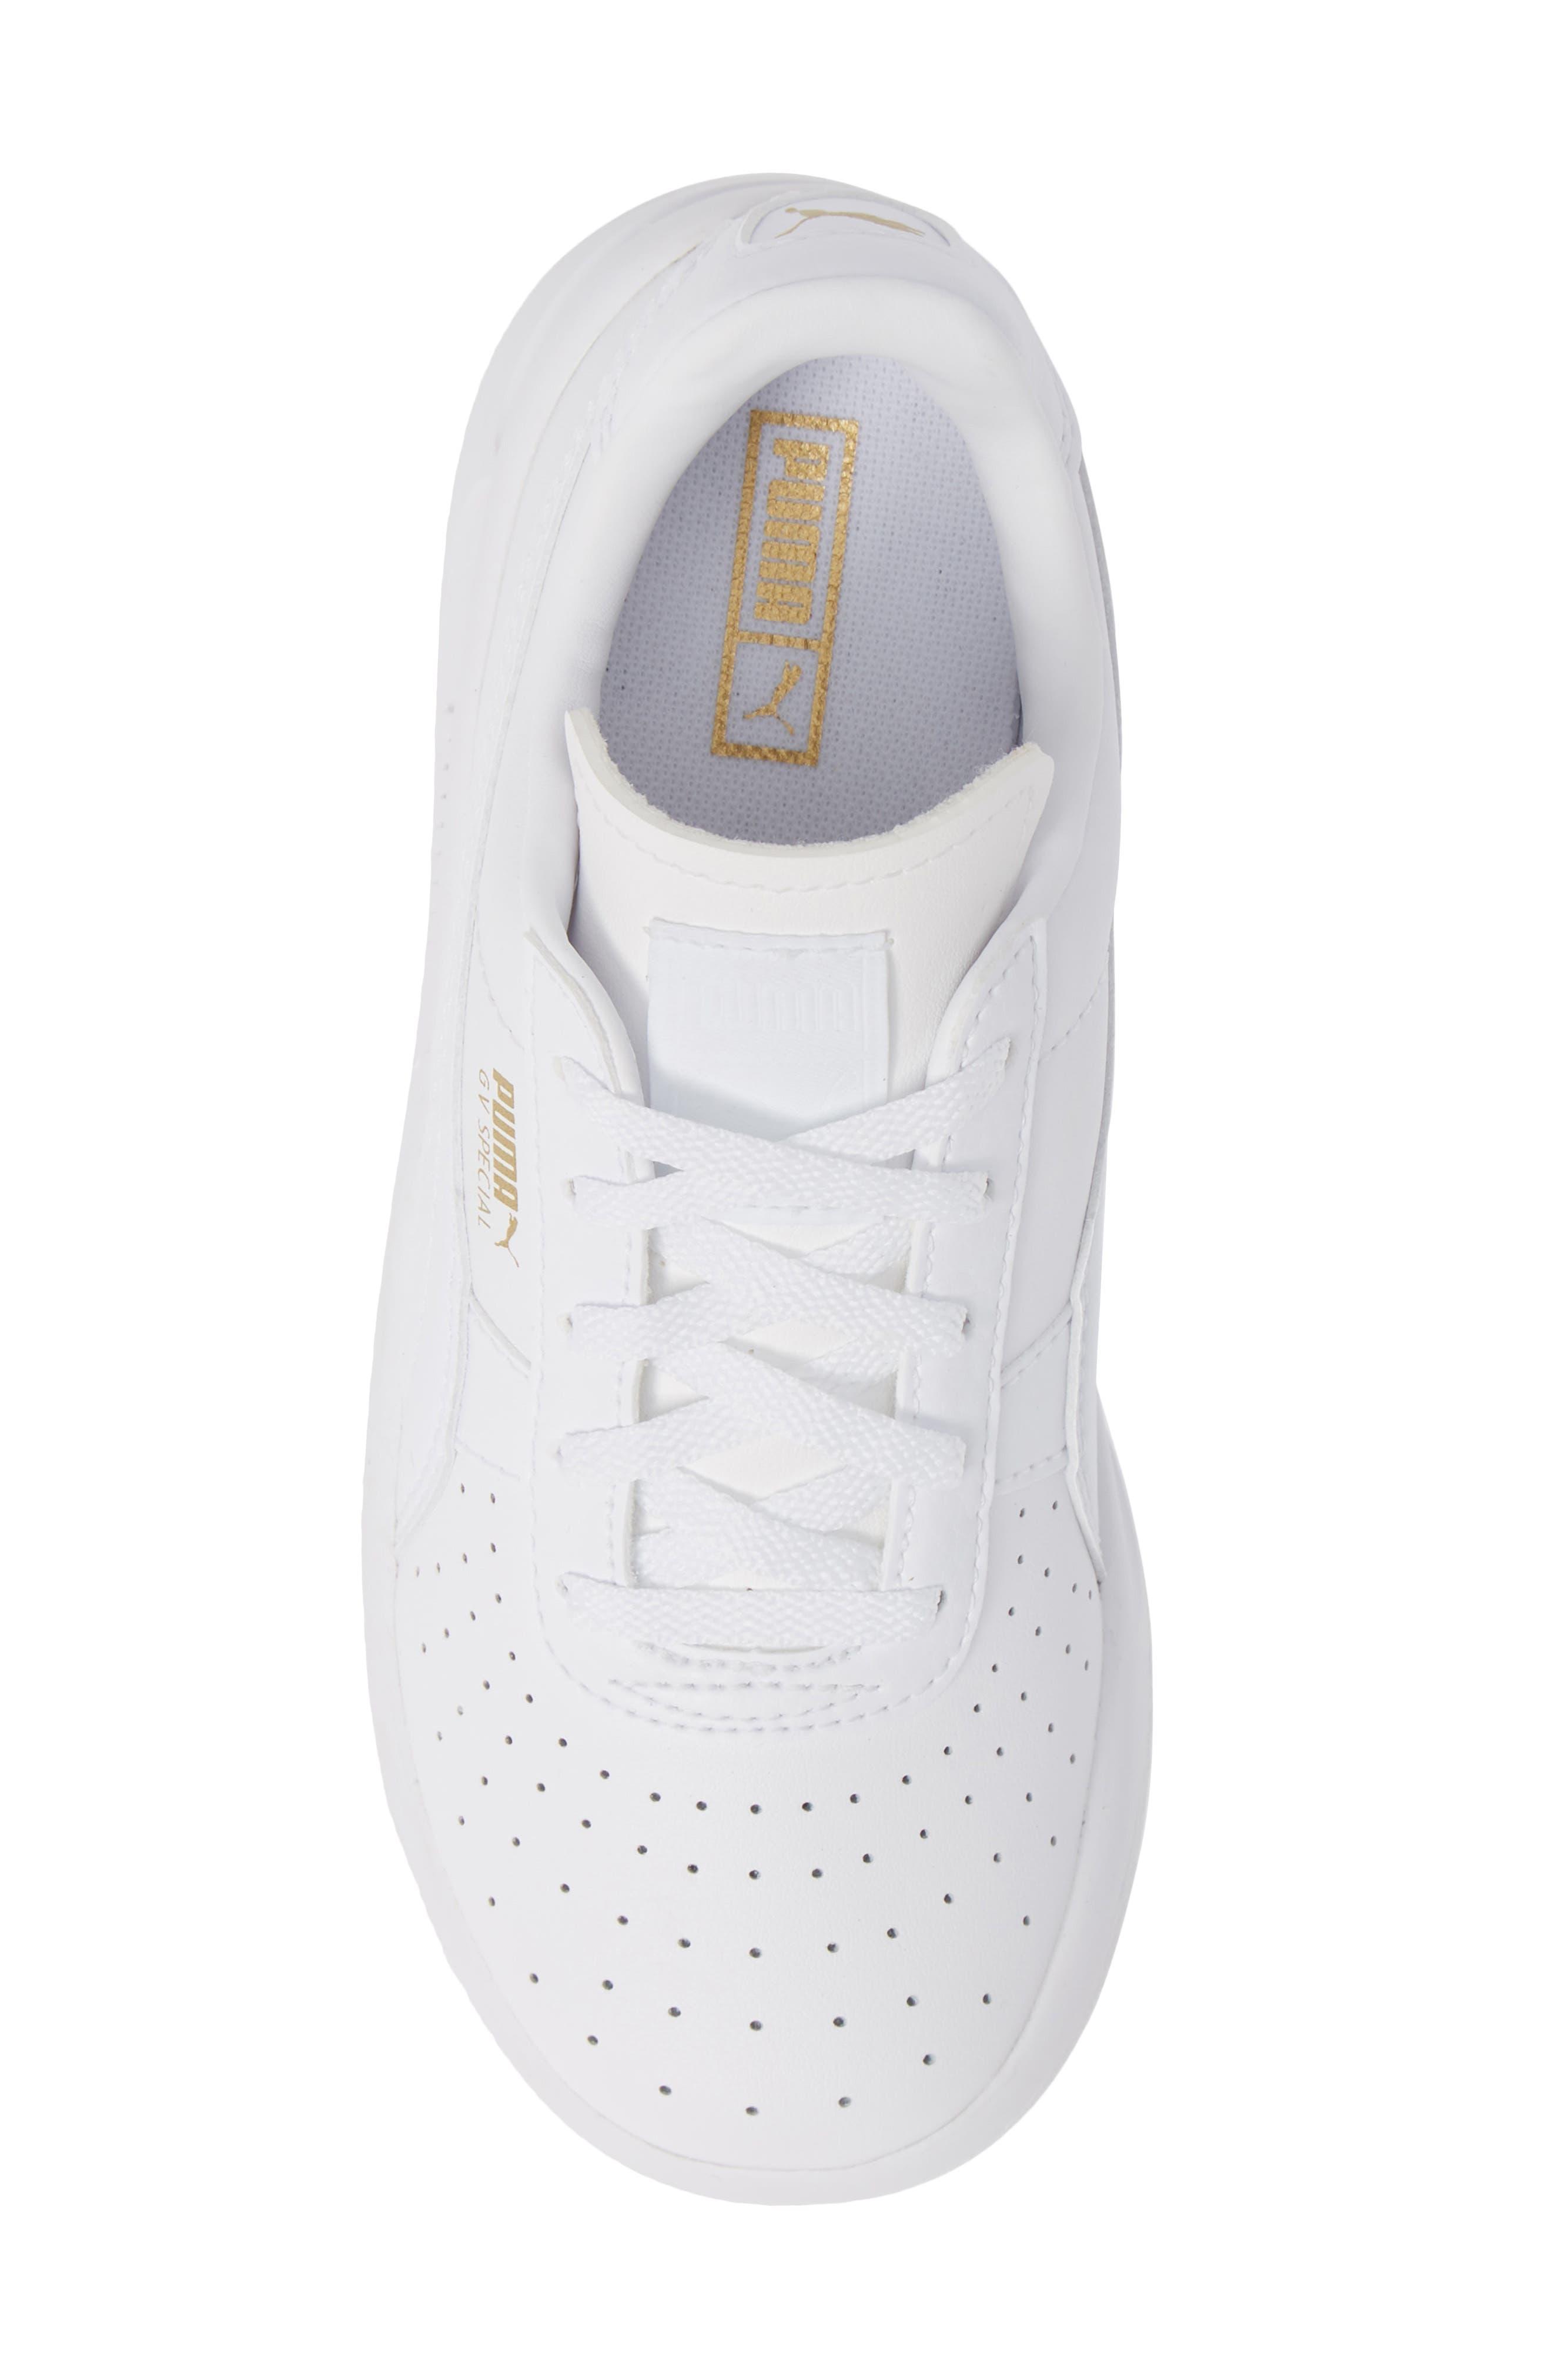 PUMA, 'GV Special' Sneaker, Alternate thumbnail 5, color, PUMA WHITE-PUMA TEAM GOLD